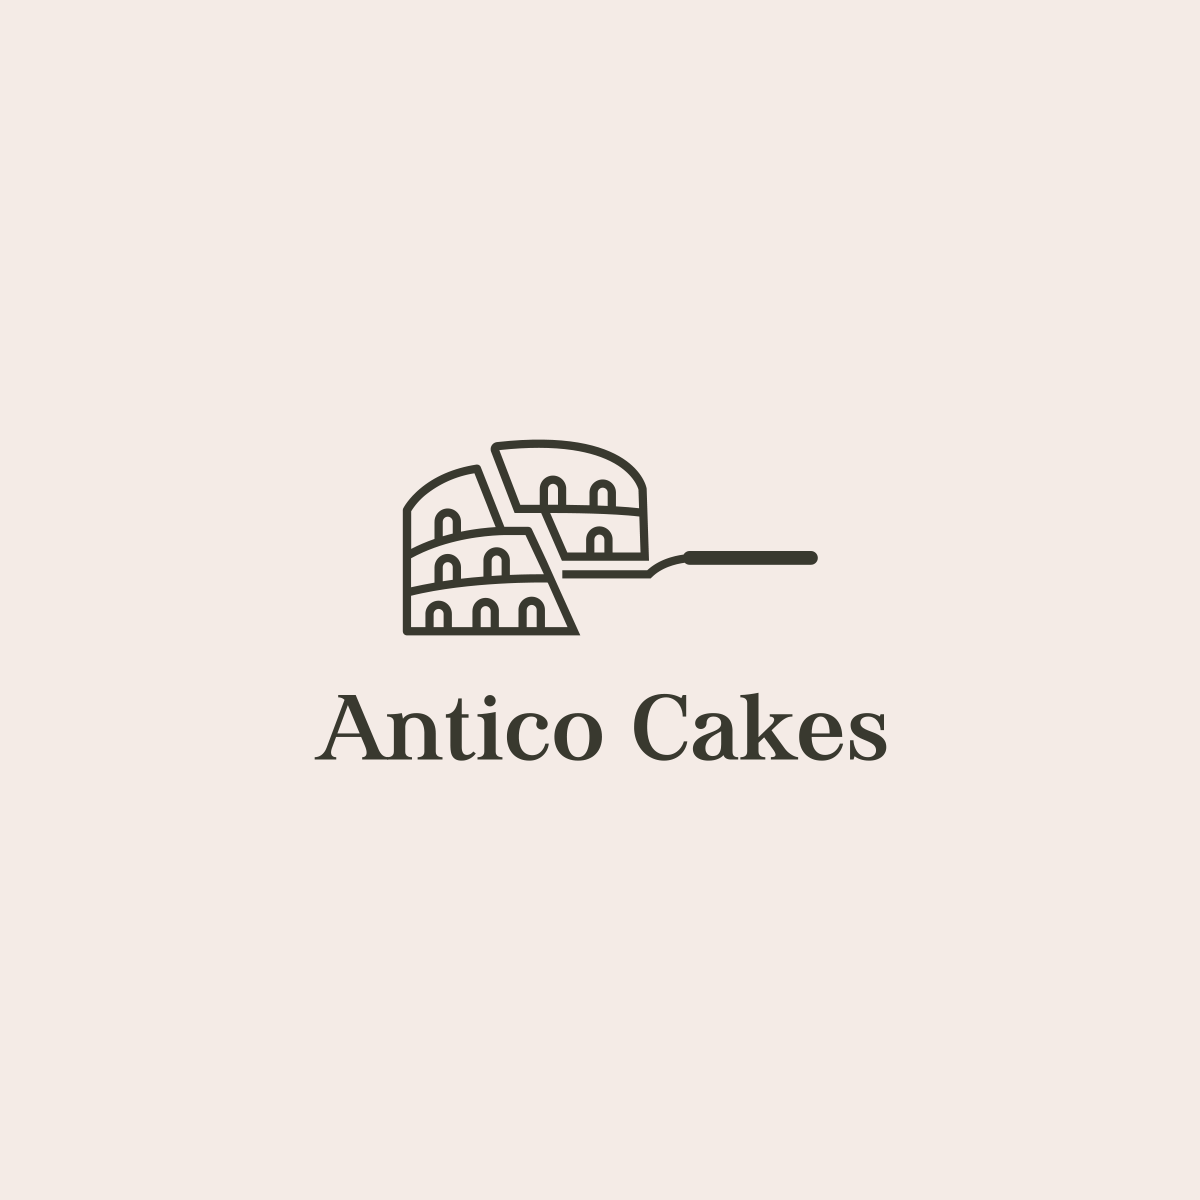 Logo for Antico Cakes 🇮🇹 .  If you're looking for logo design. ↳ ramin@nasibov.me https://t.co/0J7Yag93Uk